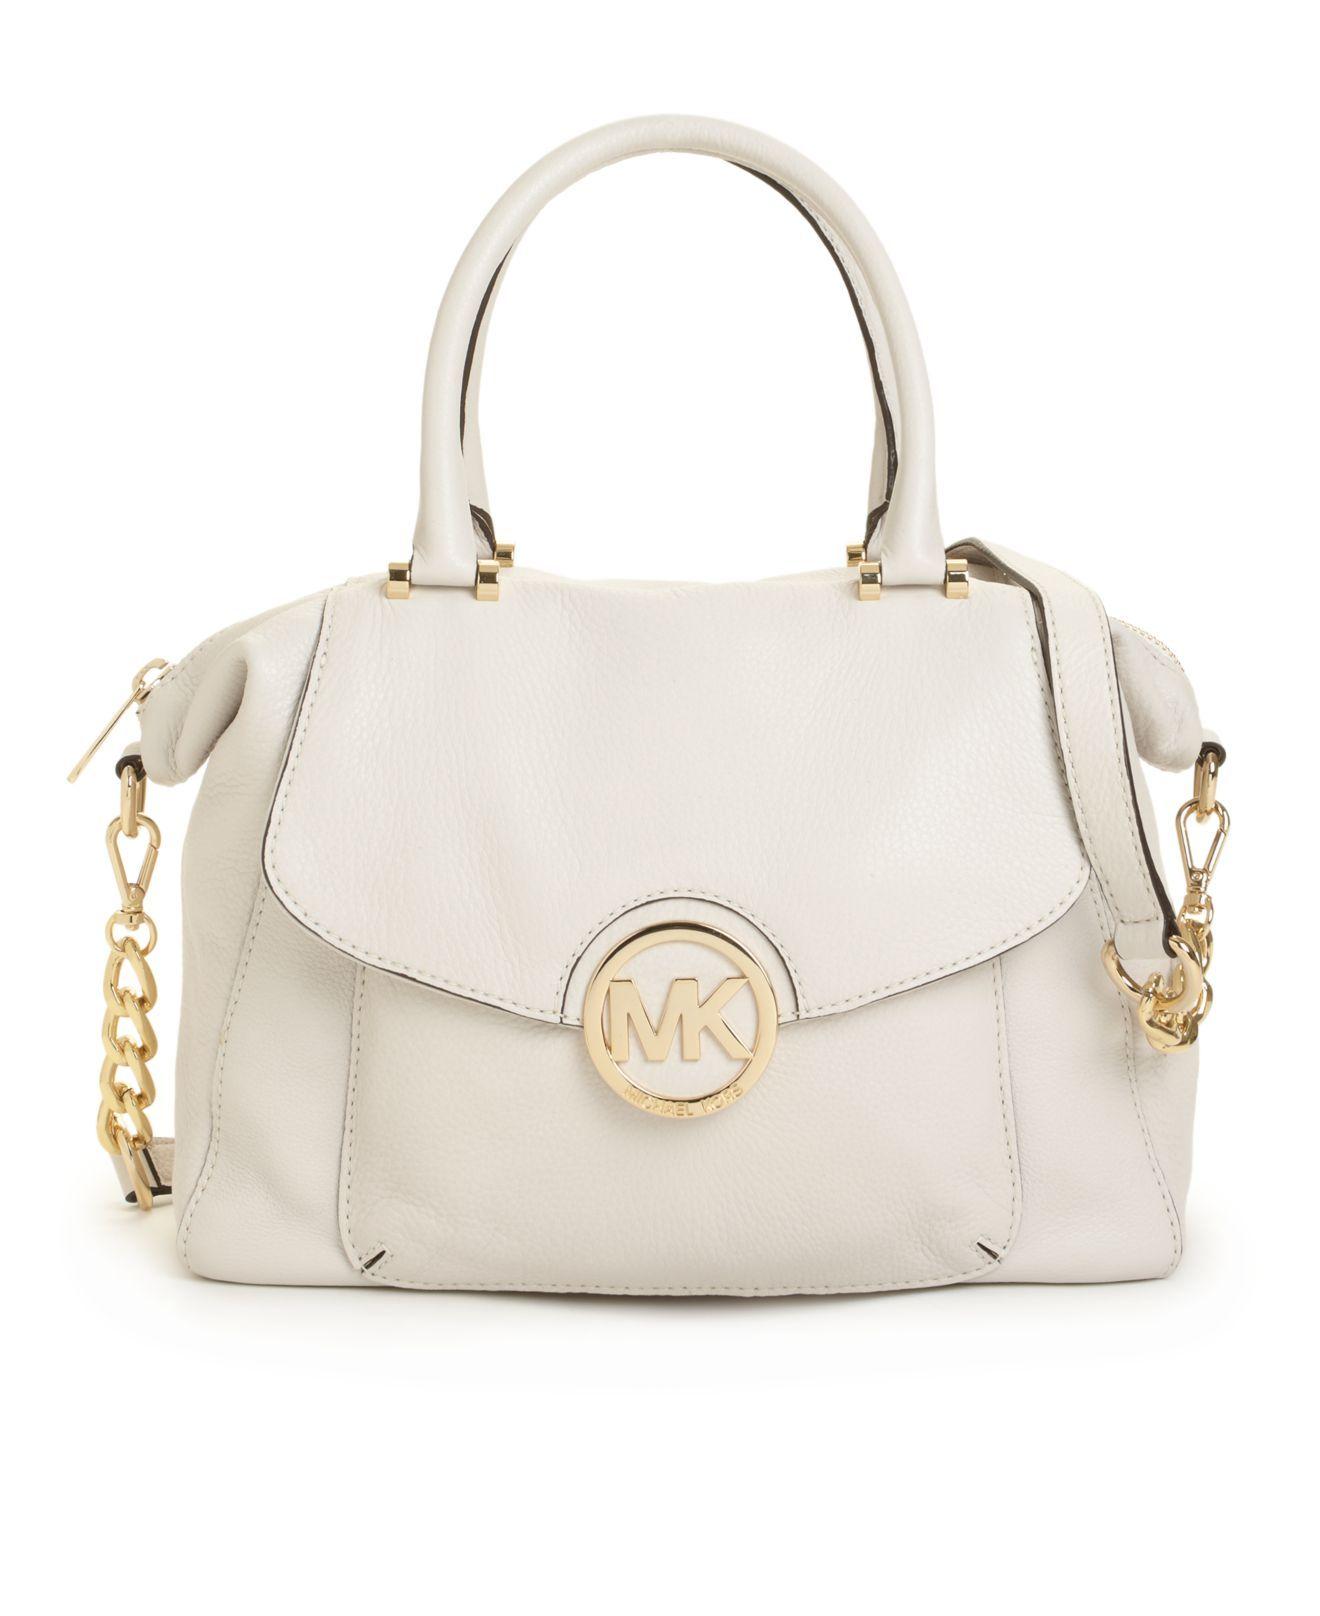 Michael Kors Handbag Fulton Satchel Handbags Accessories Macy S